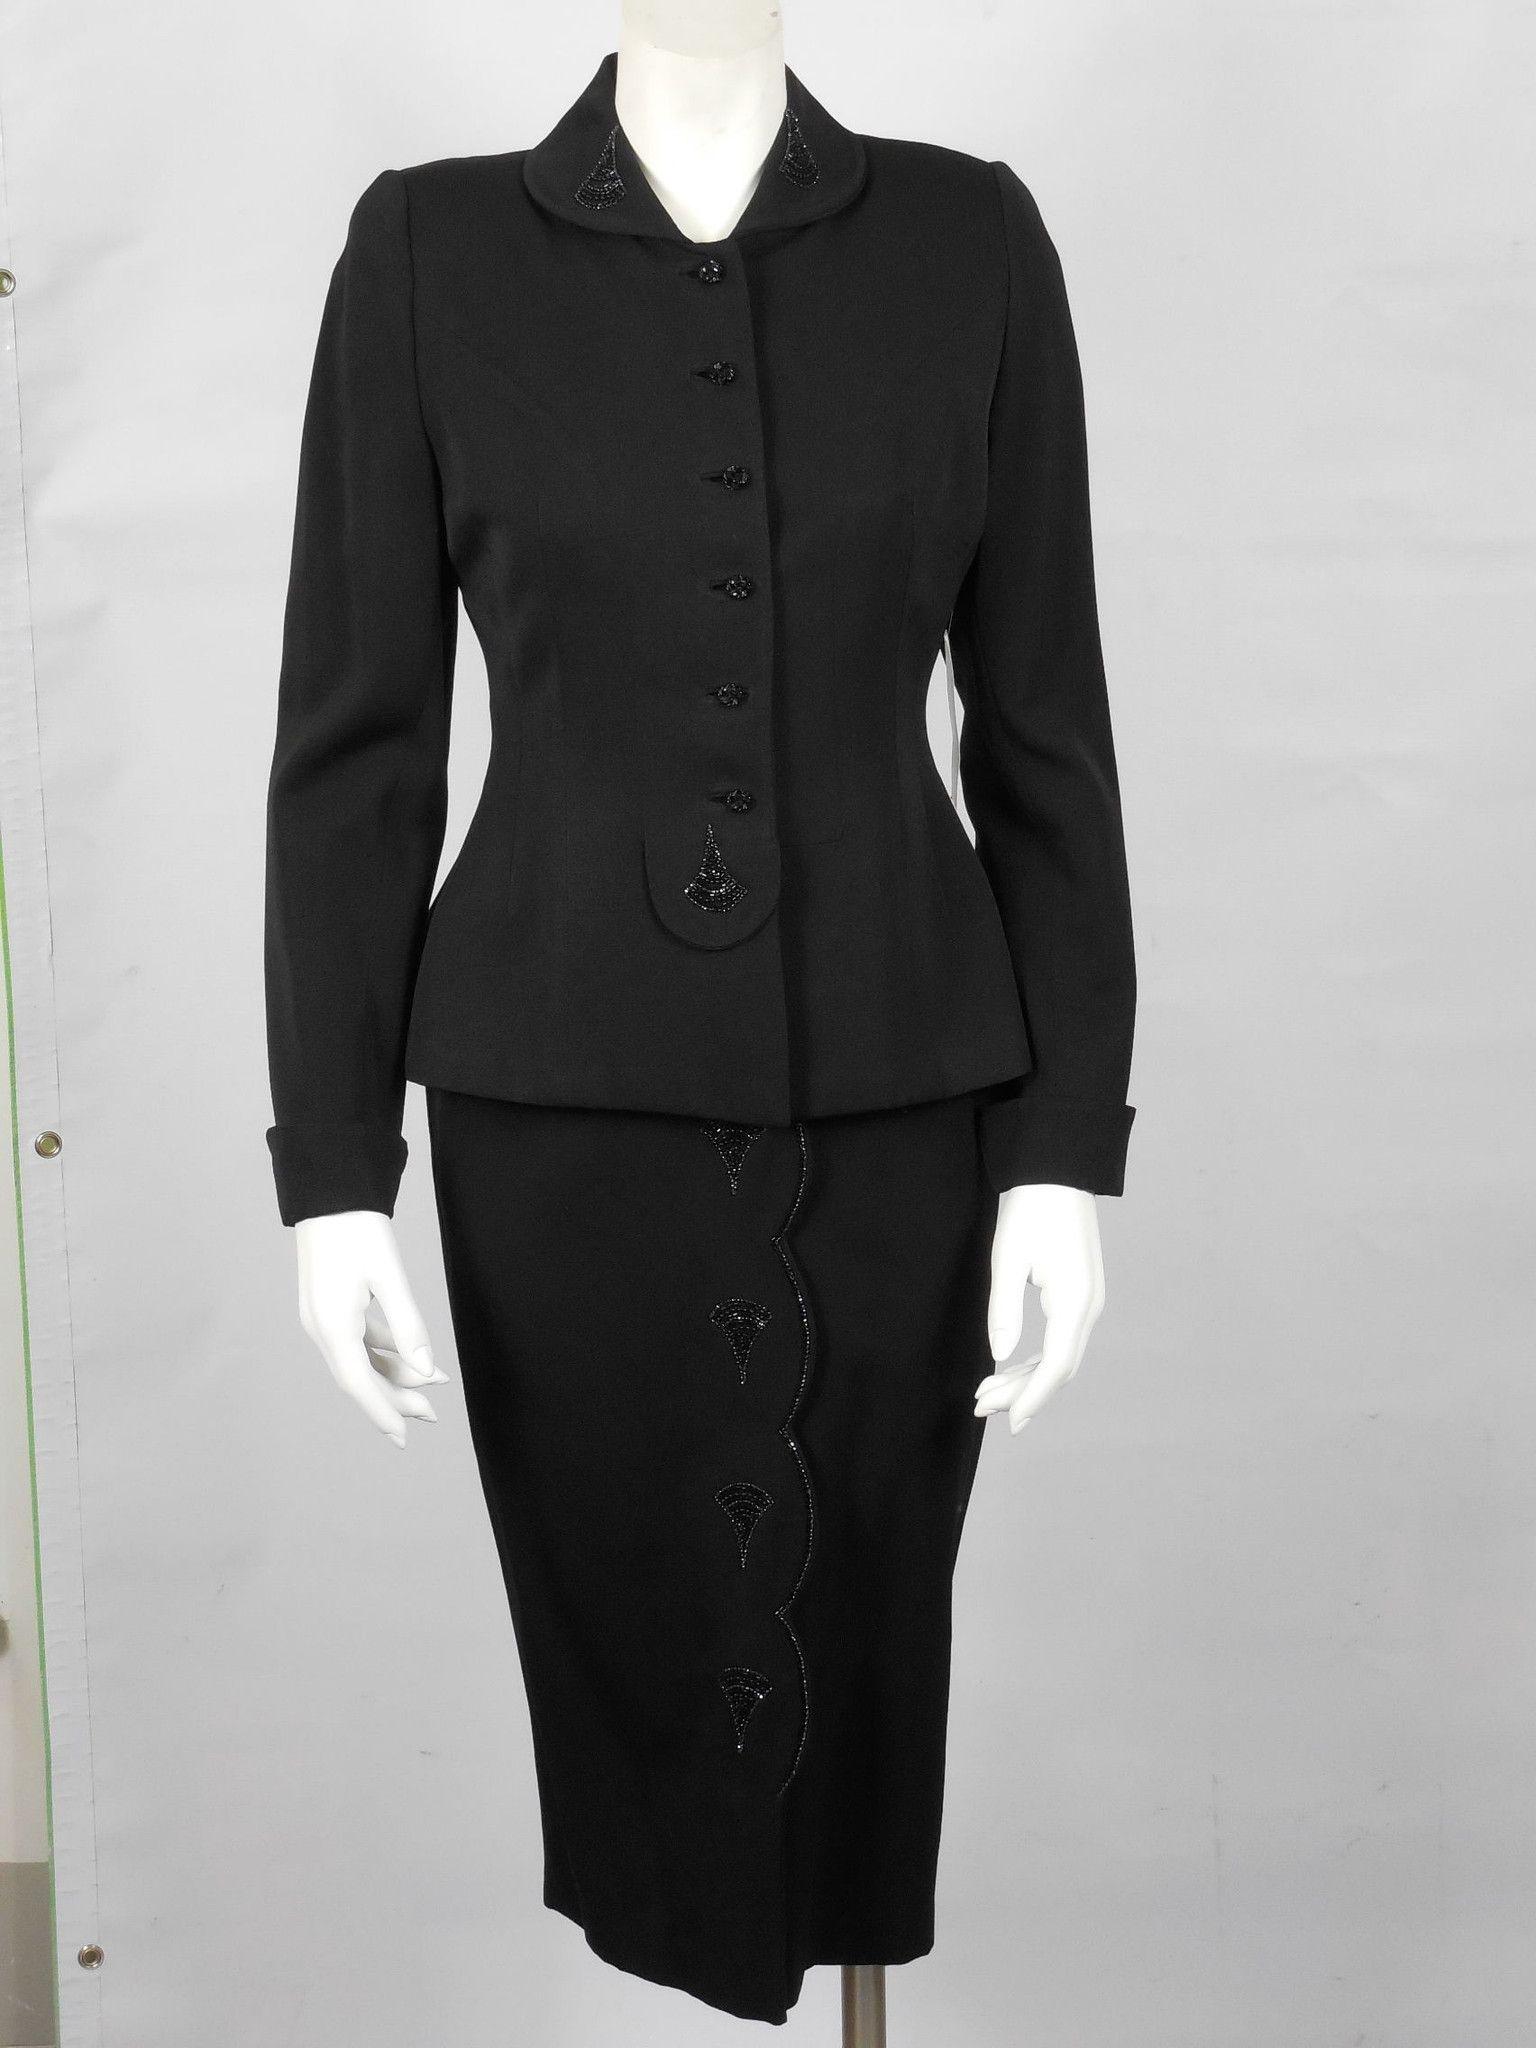 1950 Vintage Black Wool Gabardine Suit with Bead Work Embellishments